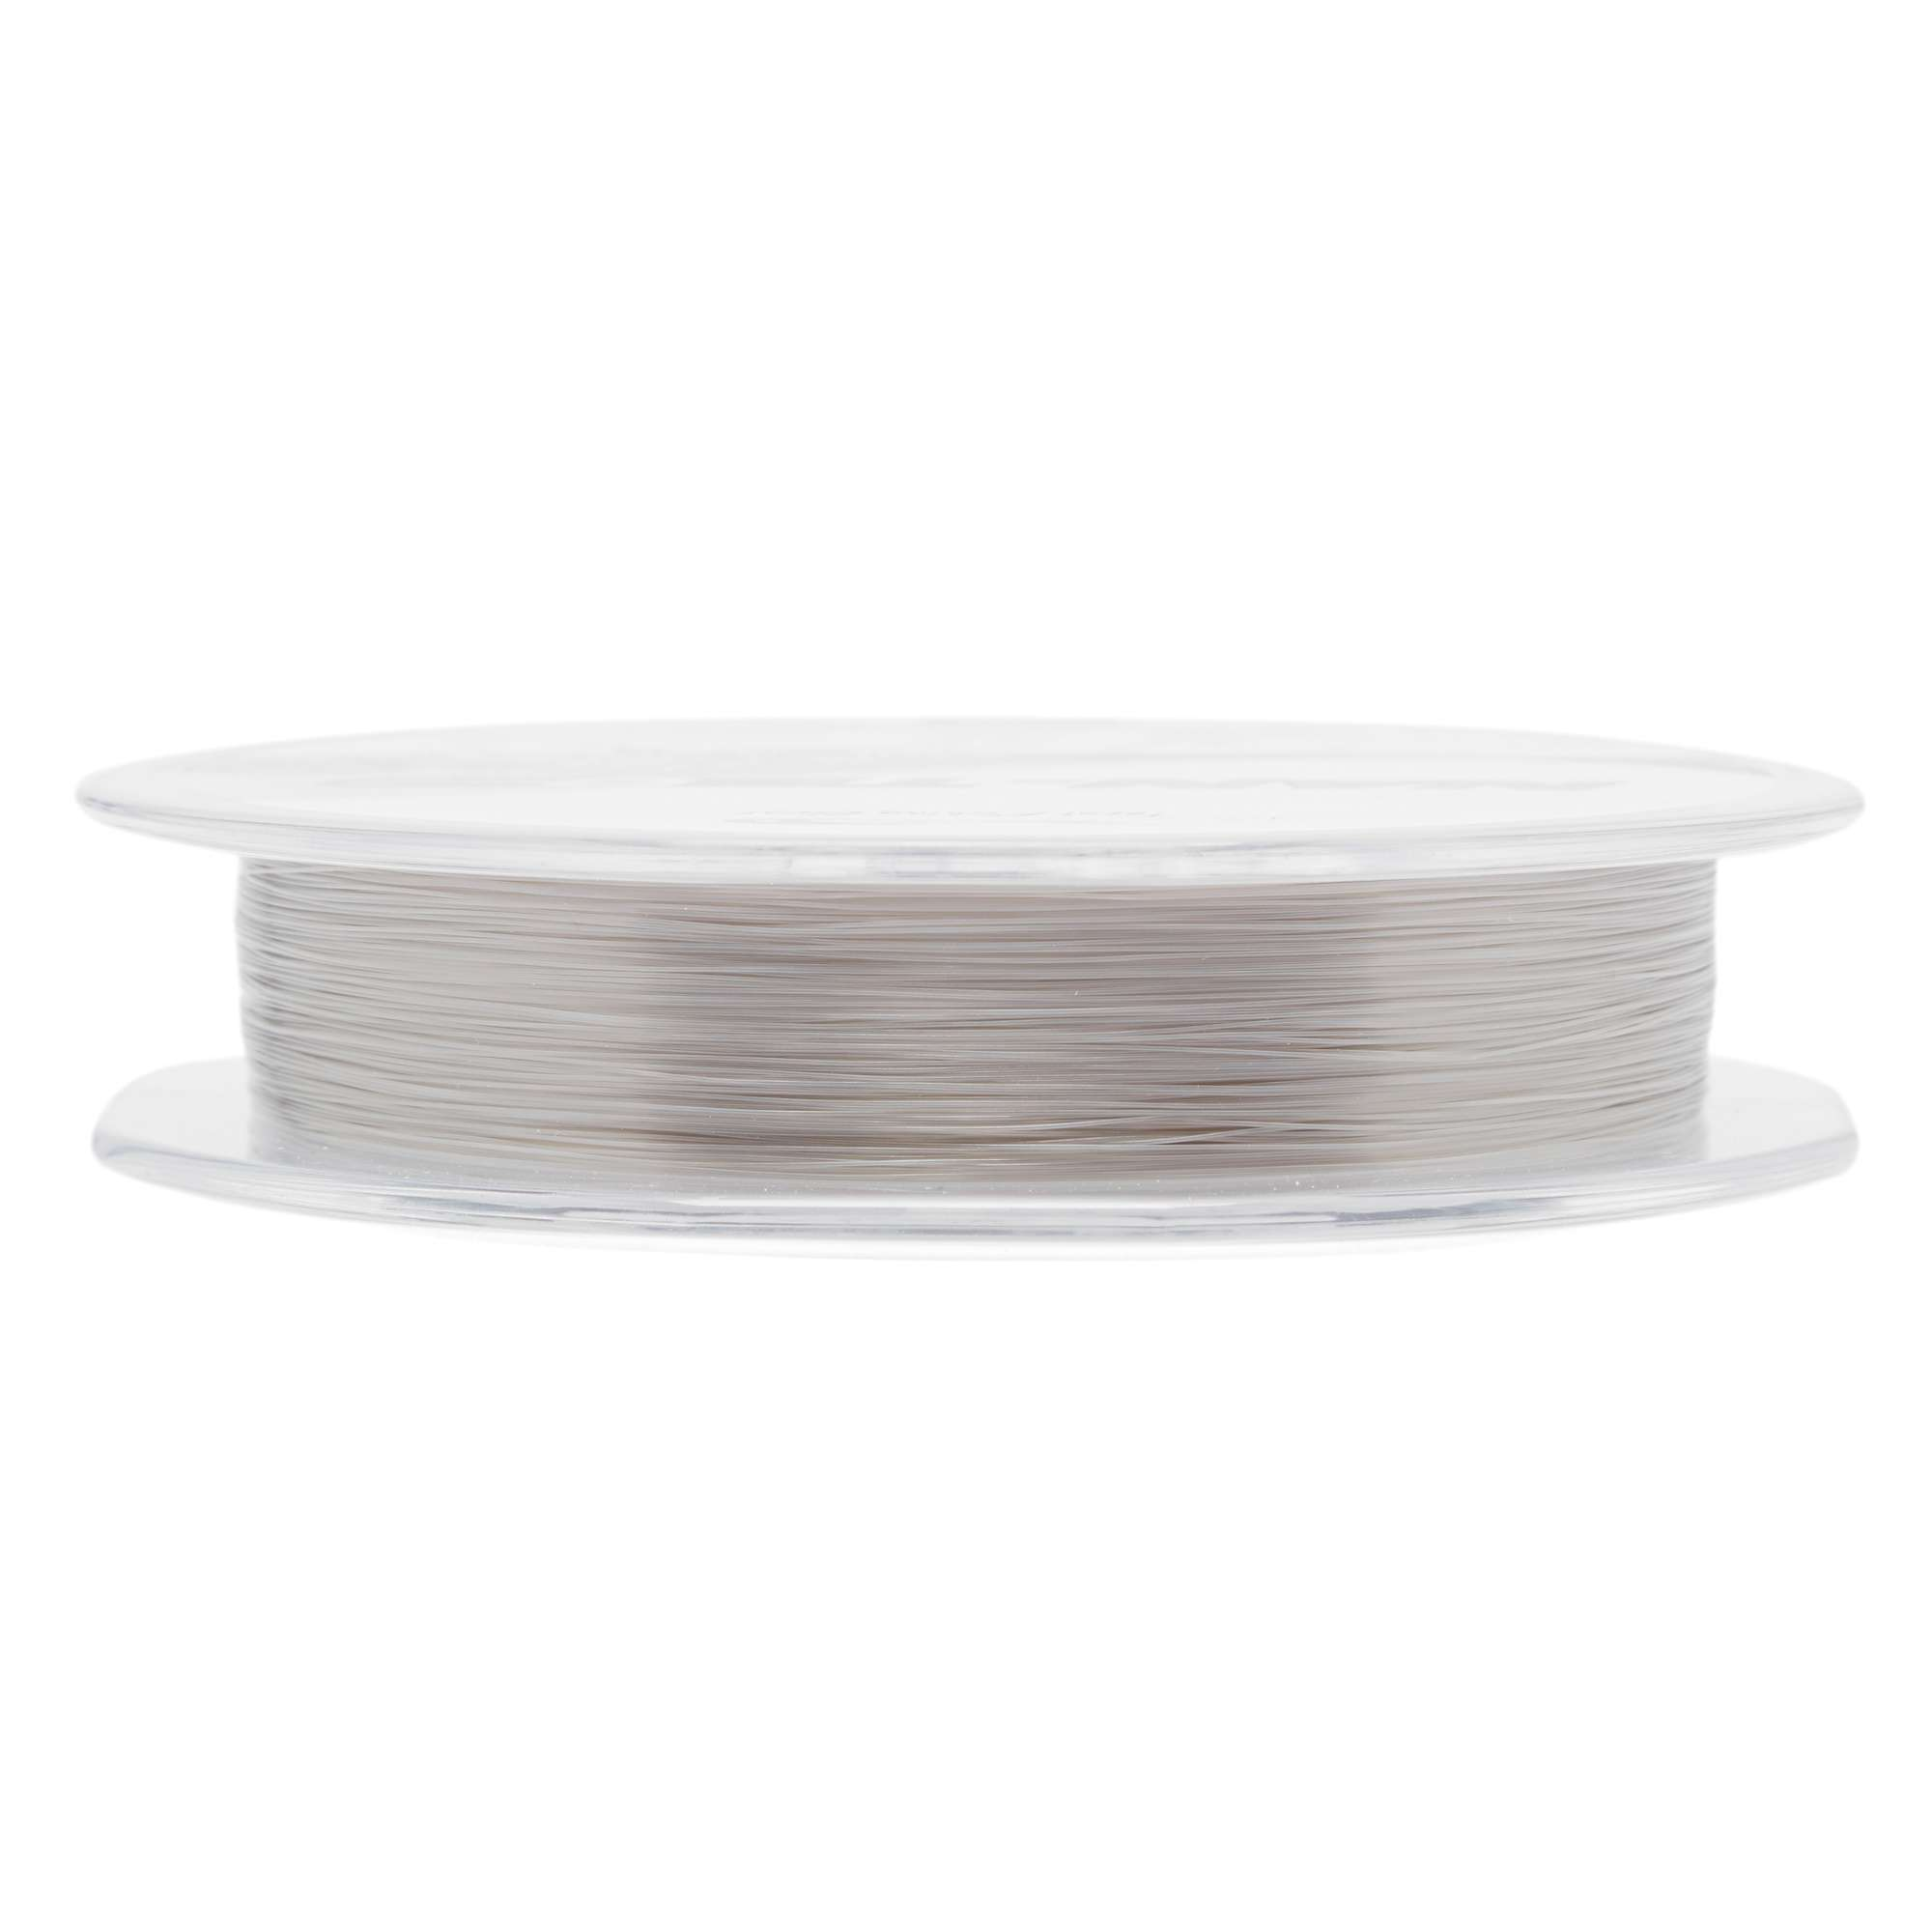 TFG Nan-Tec Mono Filament Line 6lb